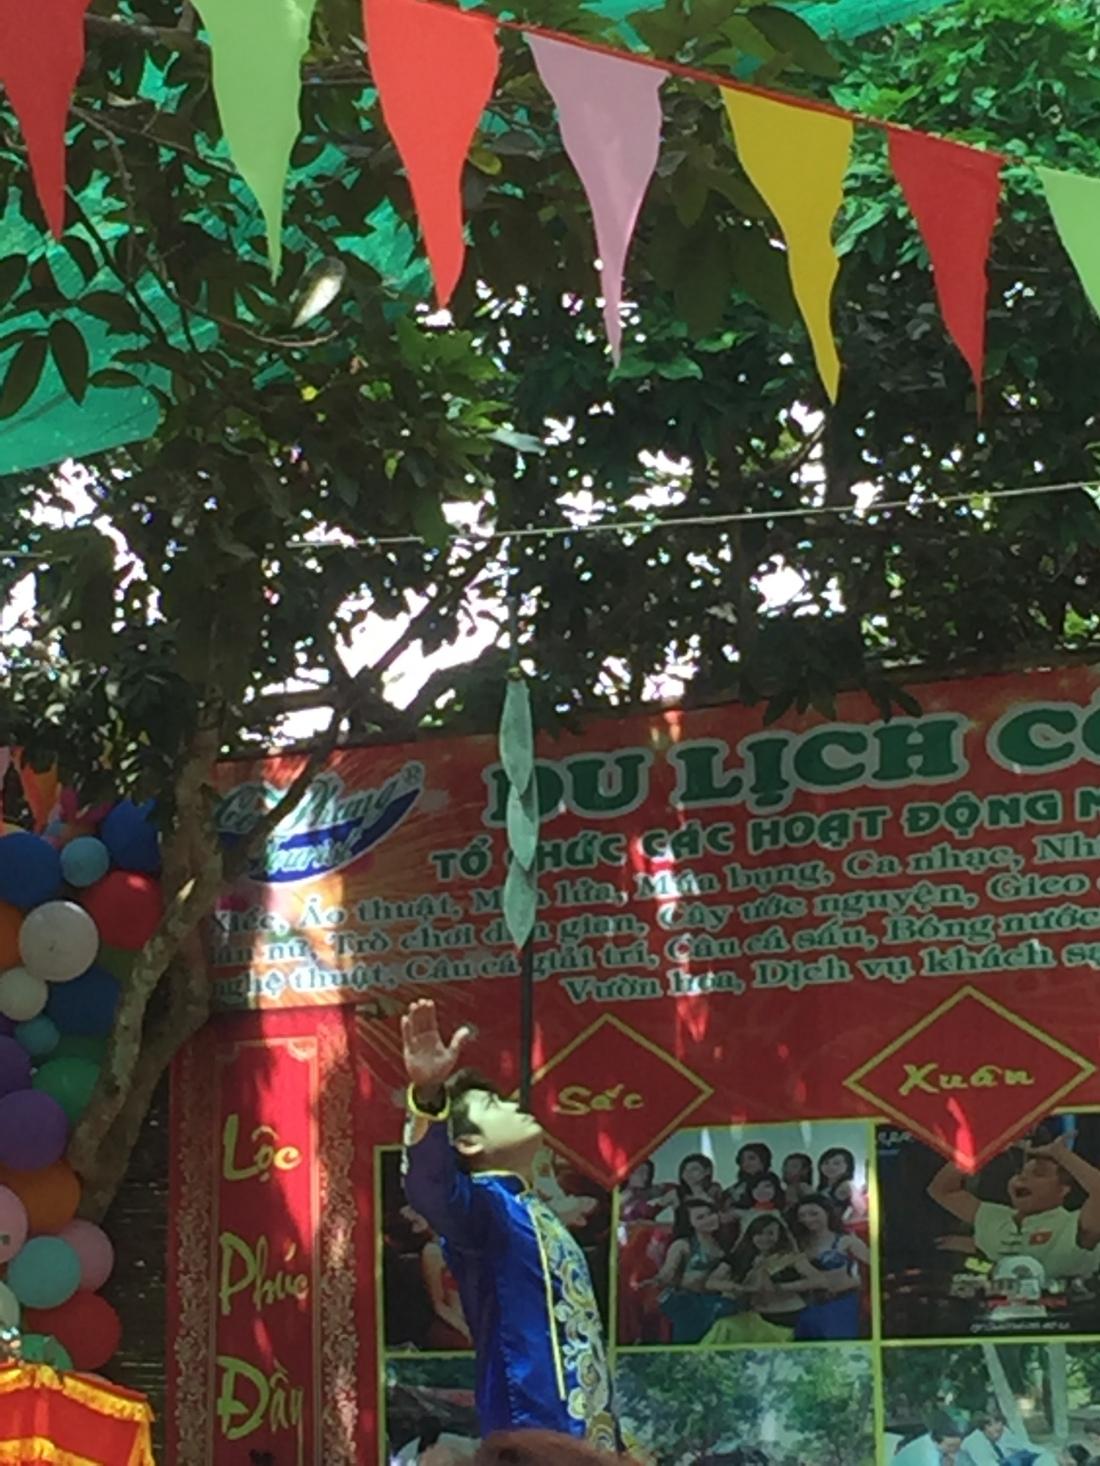 Tet Circus Celebration Mekong Delta, Vietnam